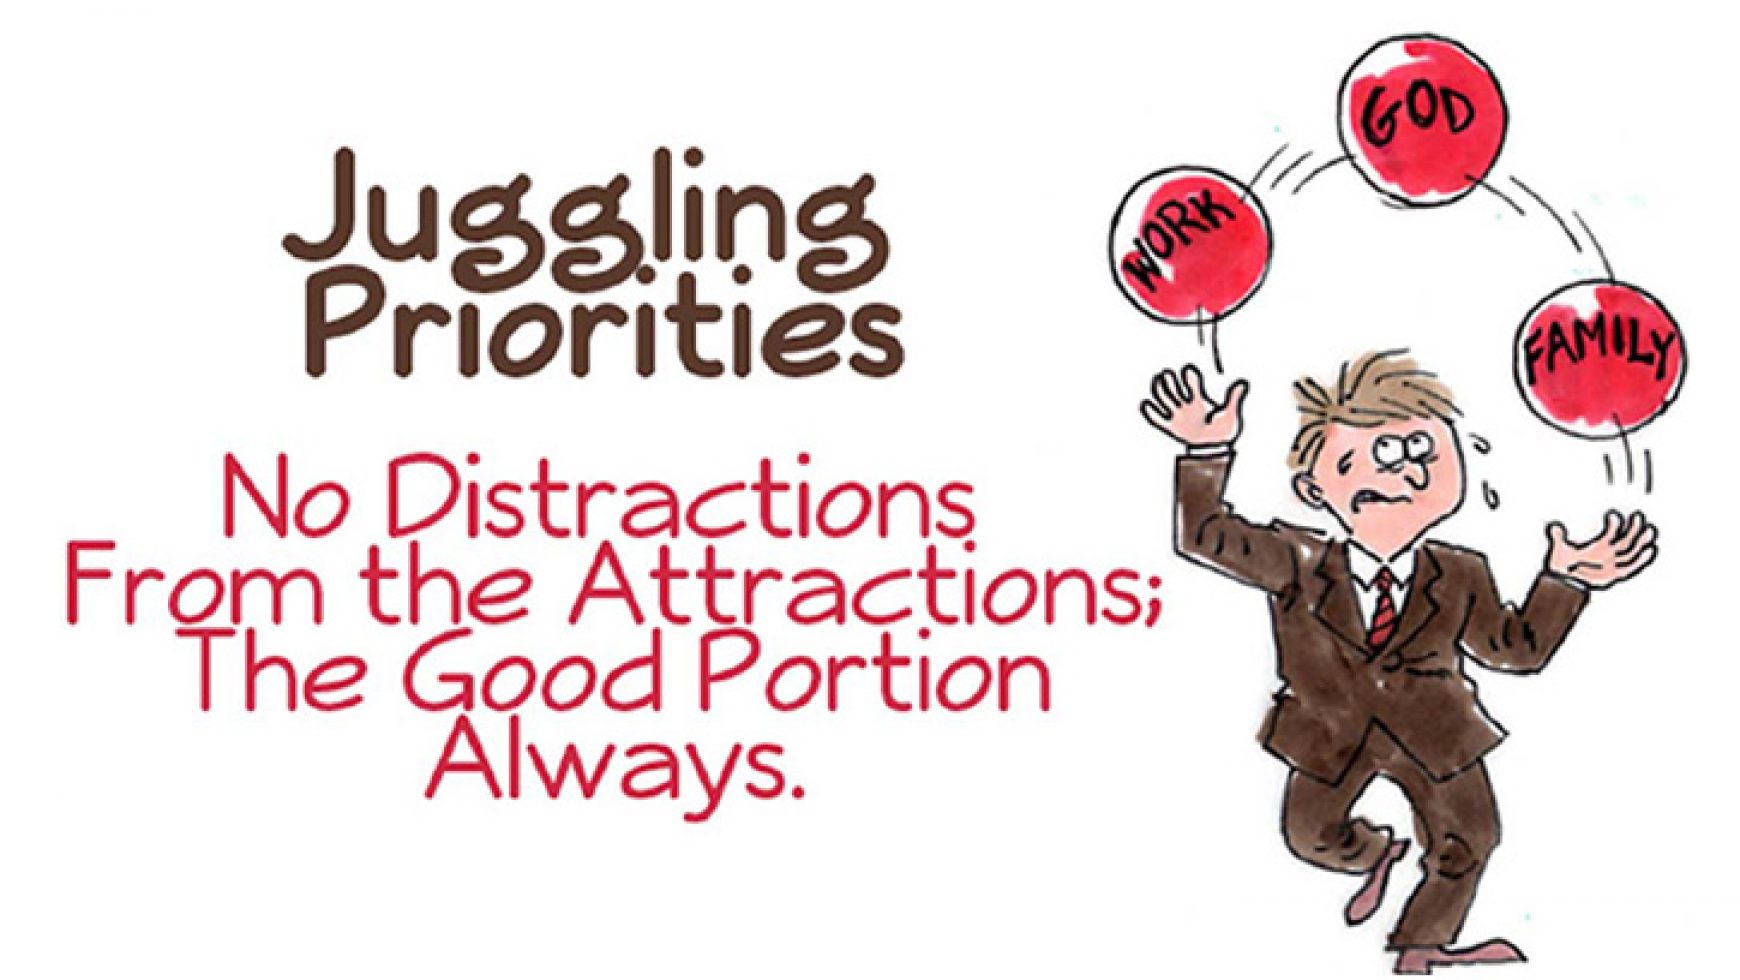 Juggling Priorities